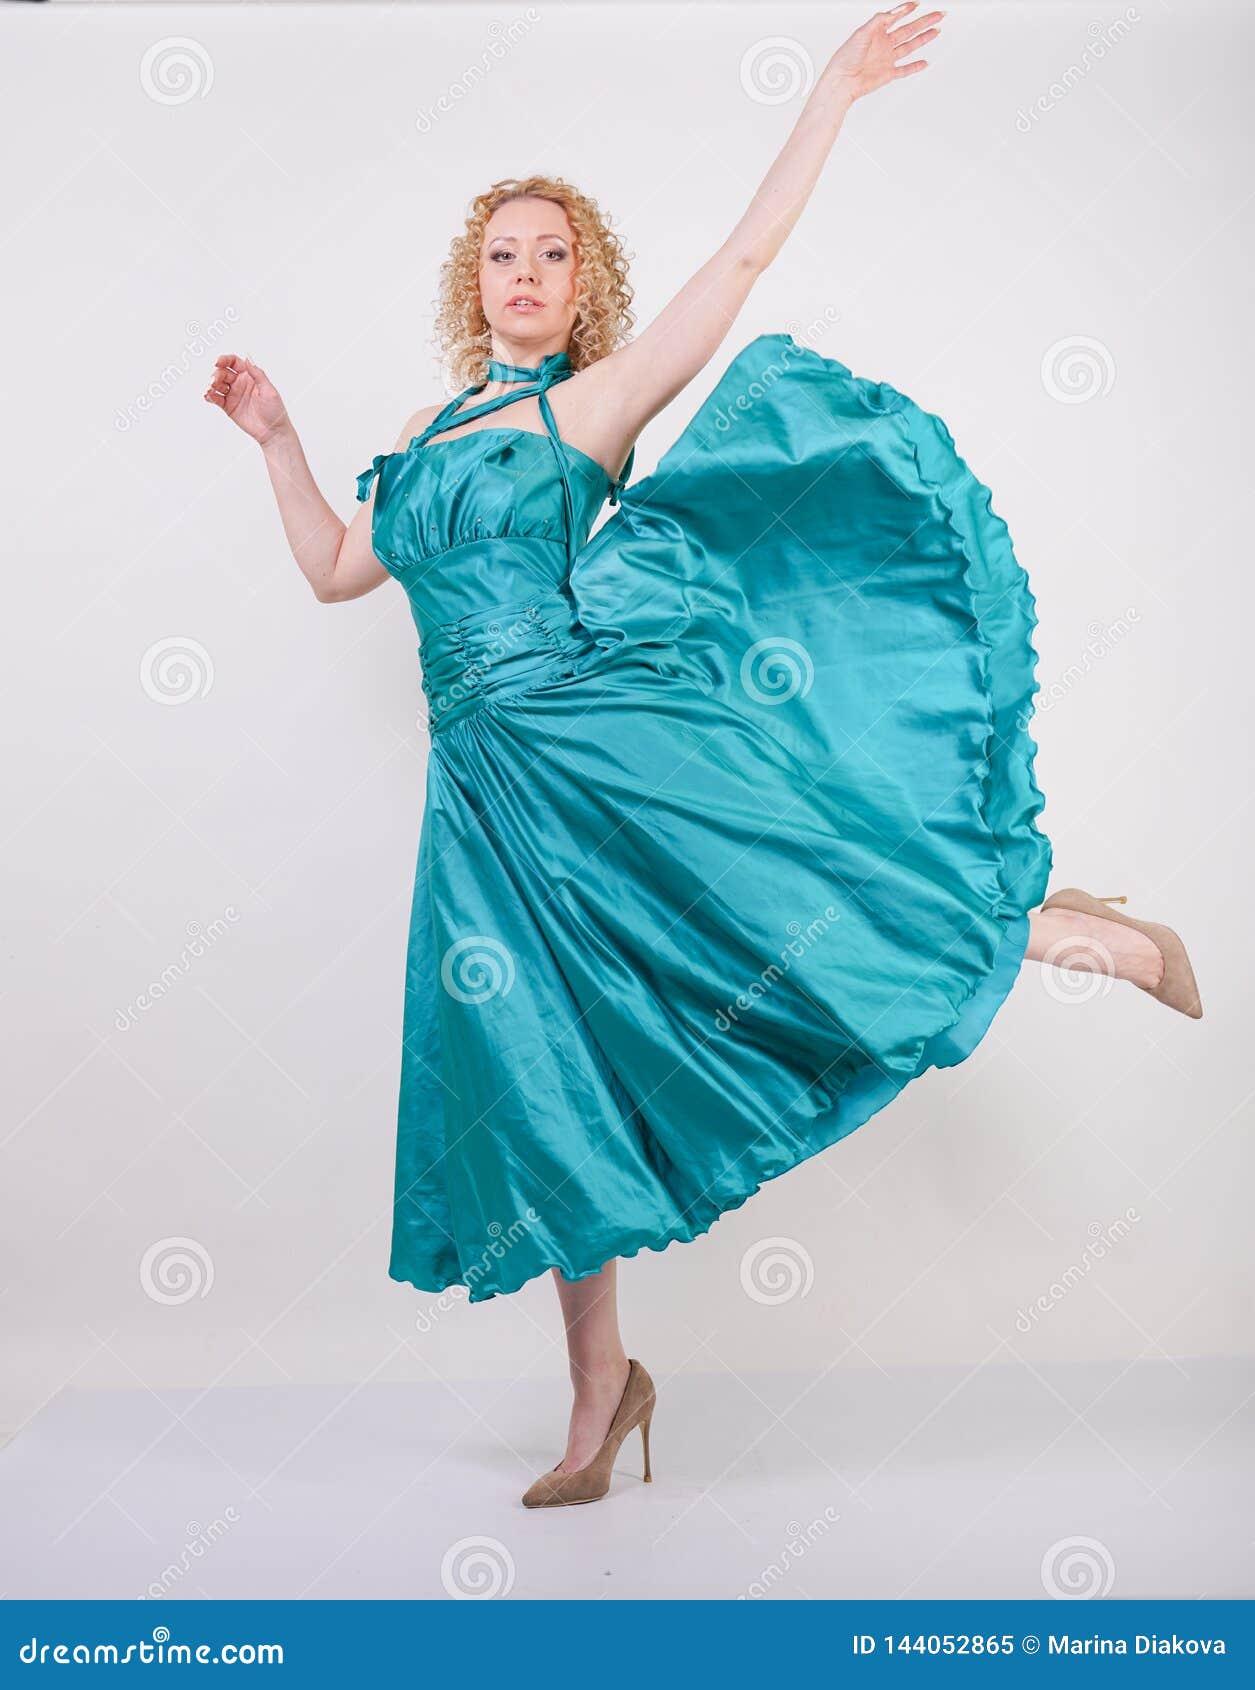 Slim airy girl in flying blue evening dress on white background in Studio